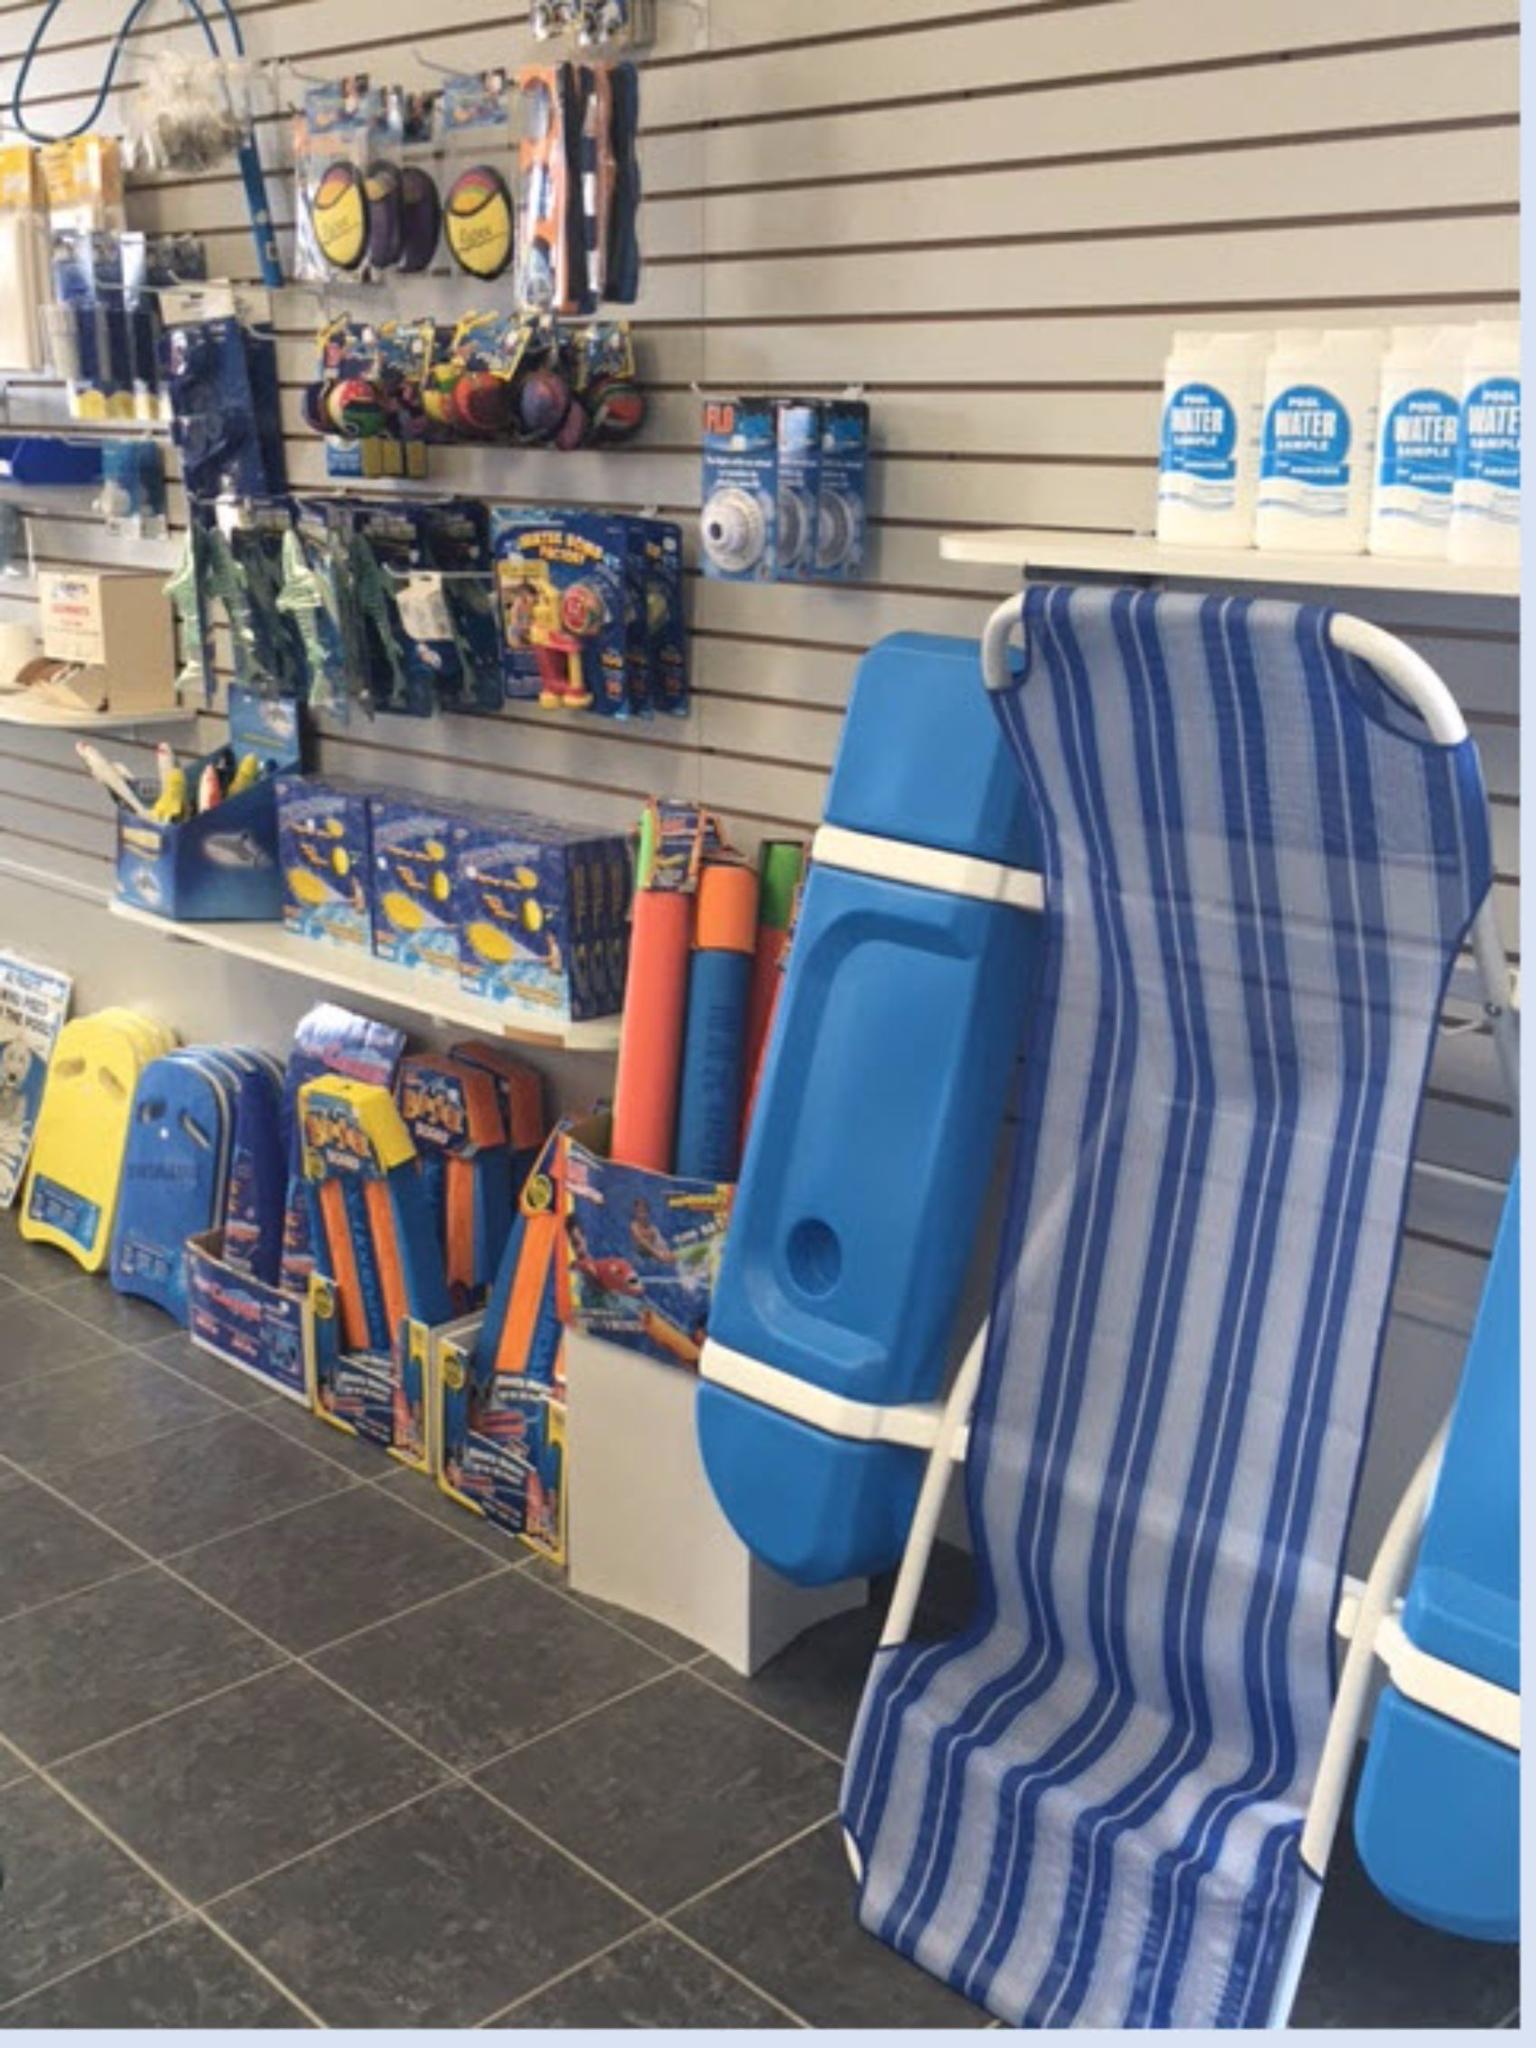 Edgil Pool Services Ltd in Simcoe